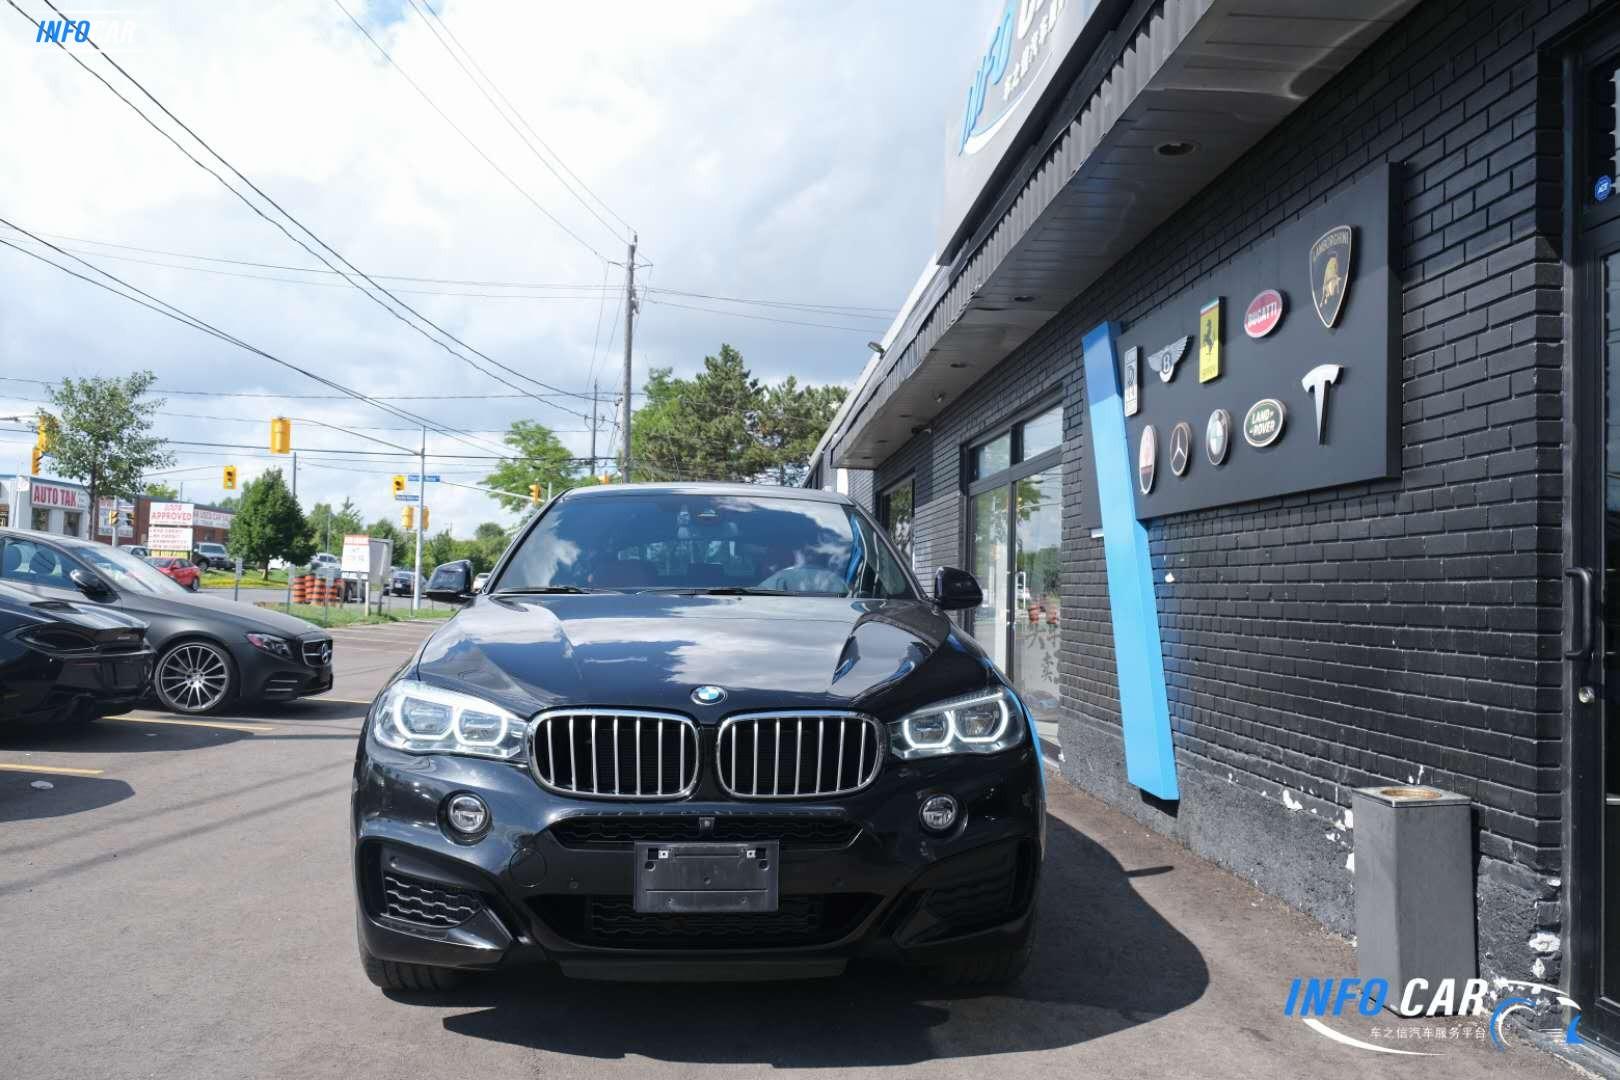 2017 BMW X6 xdrive 50i - INFOCAR - Toronto's Most Comprehensive New and Used Auto Trading Platform